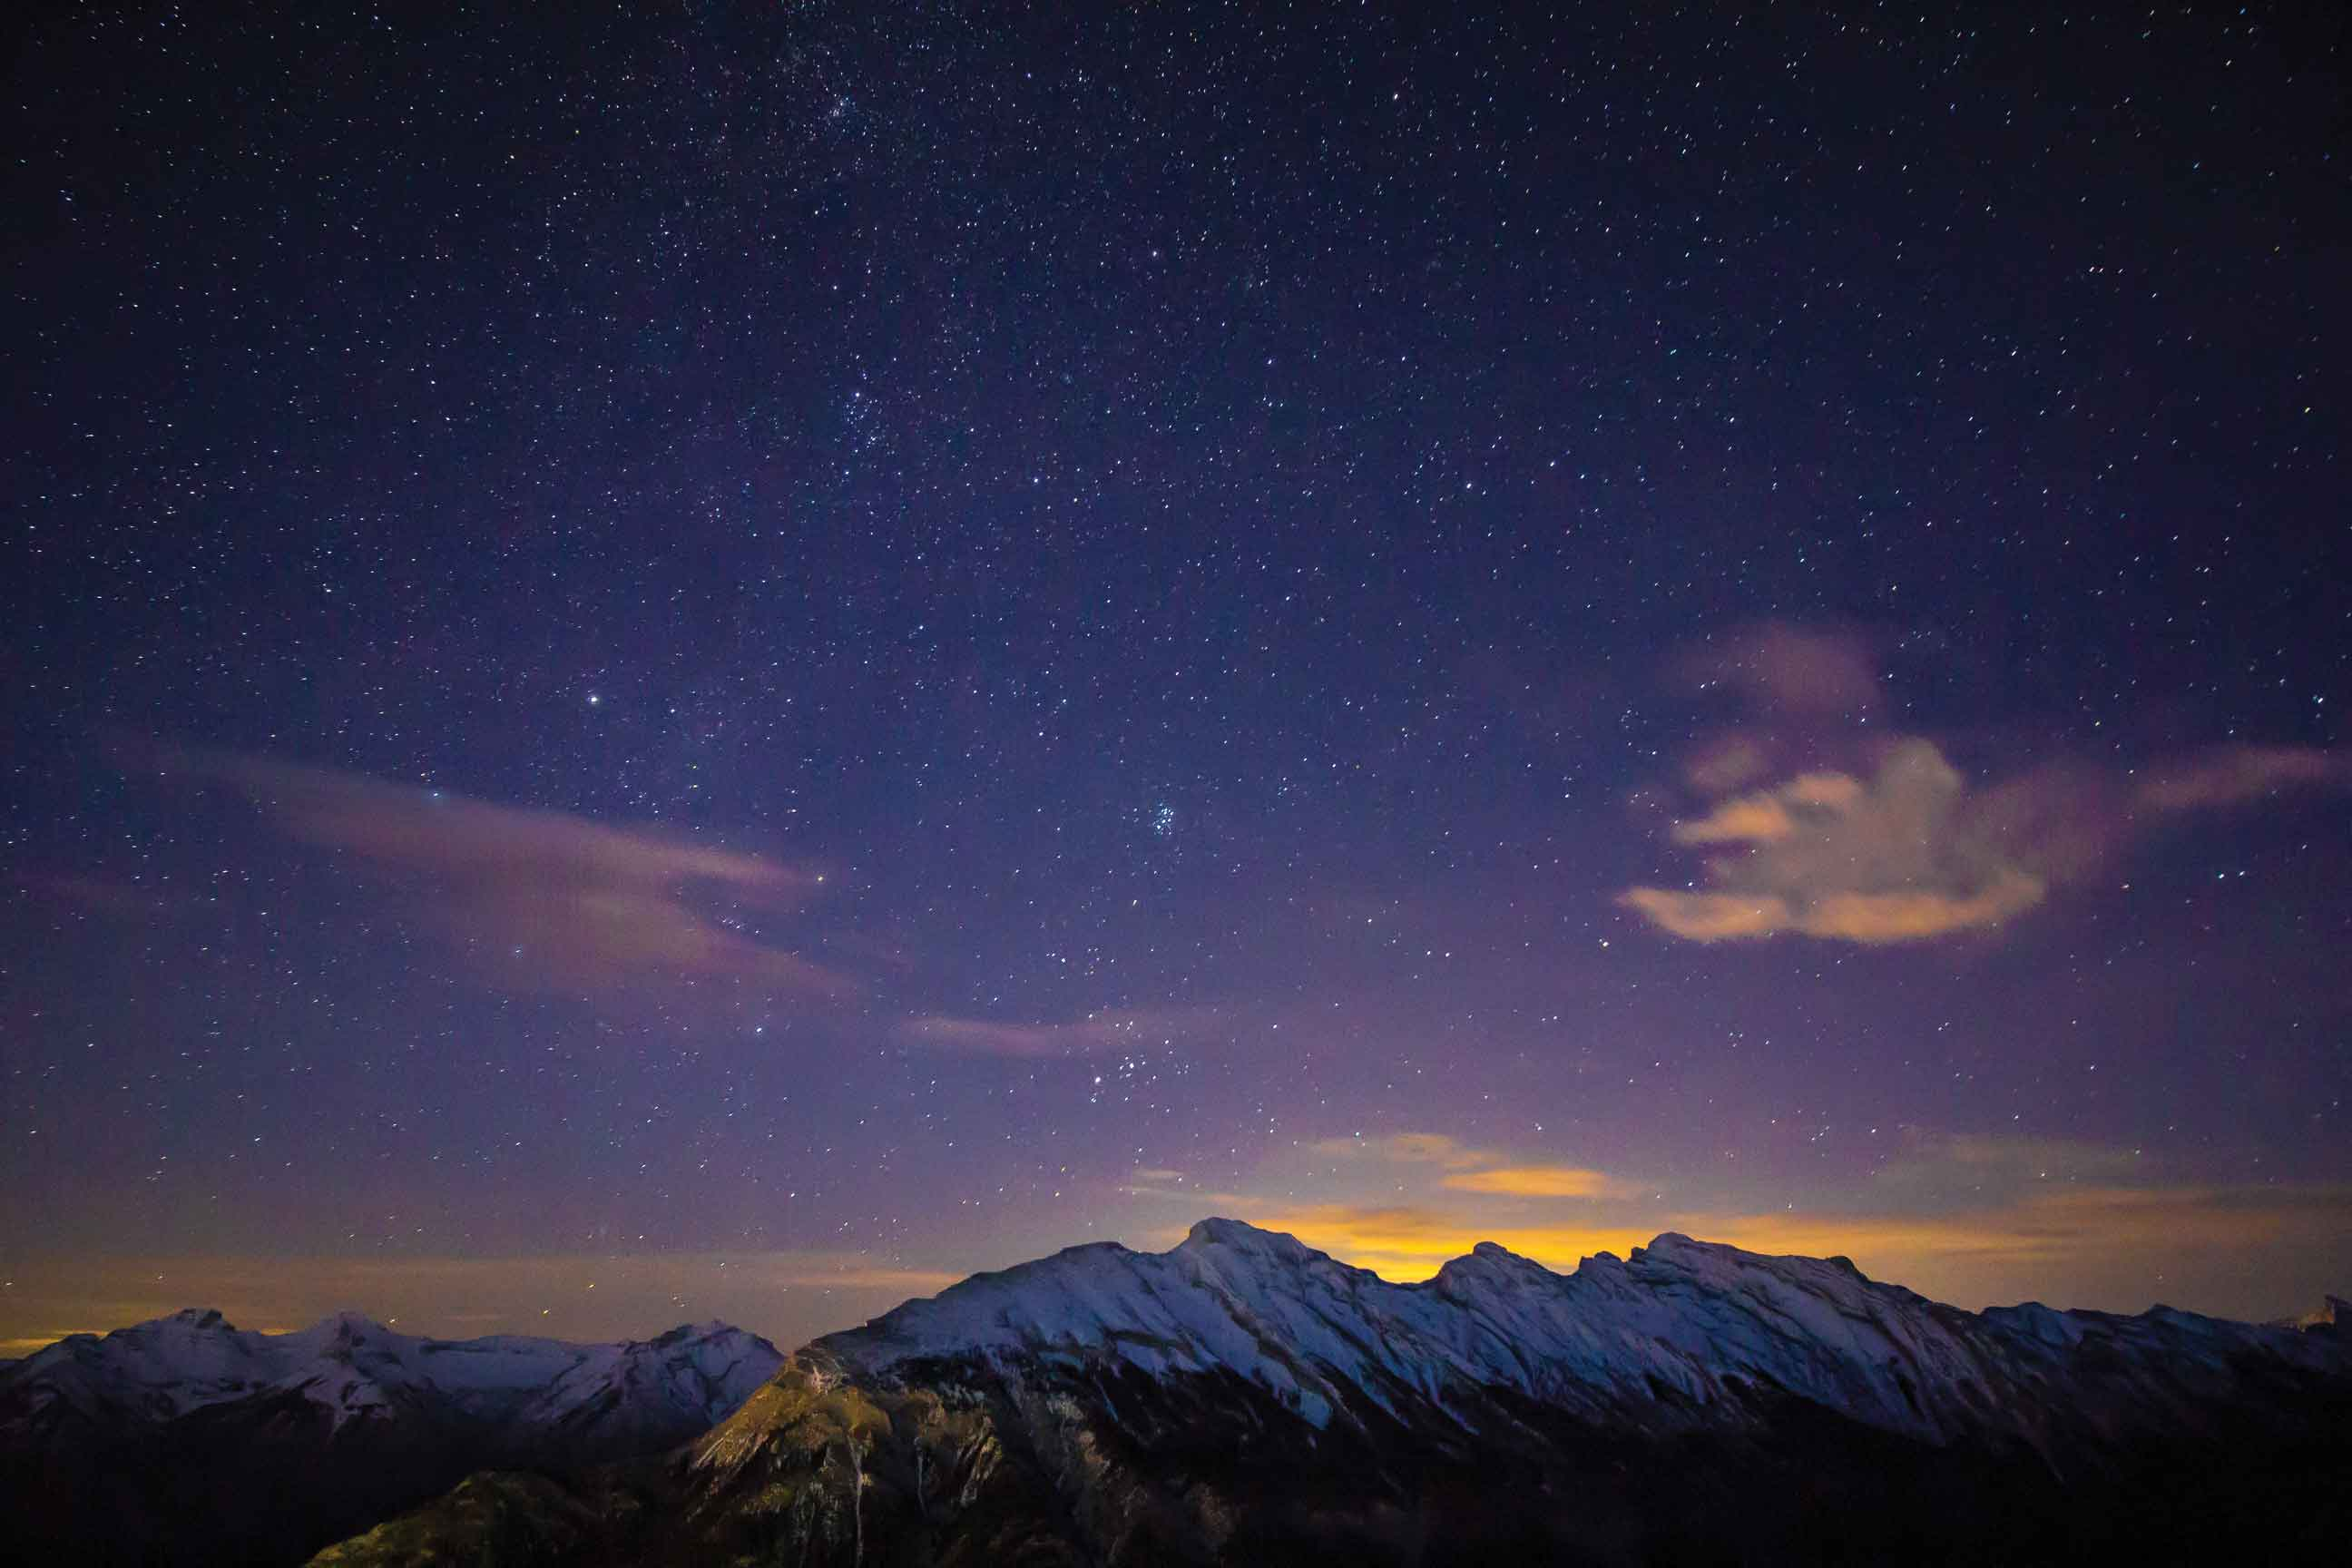 Nighttime Outdoor Adventures Banff-Gondola-by-Pursuit